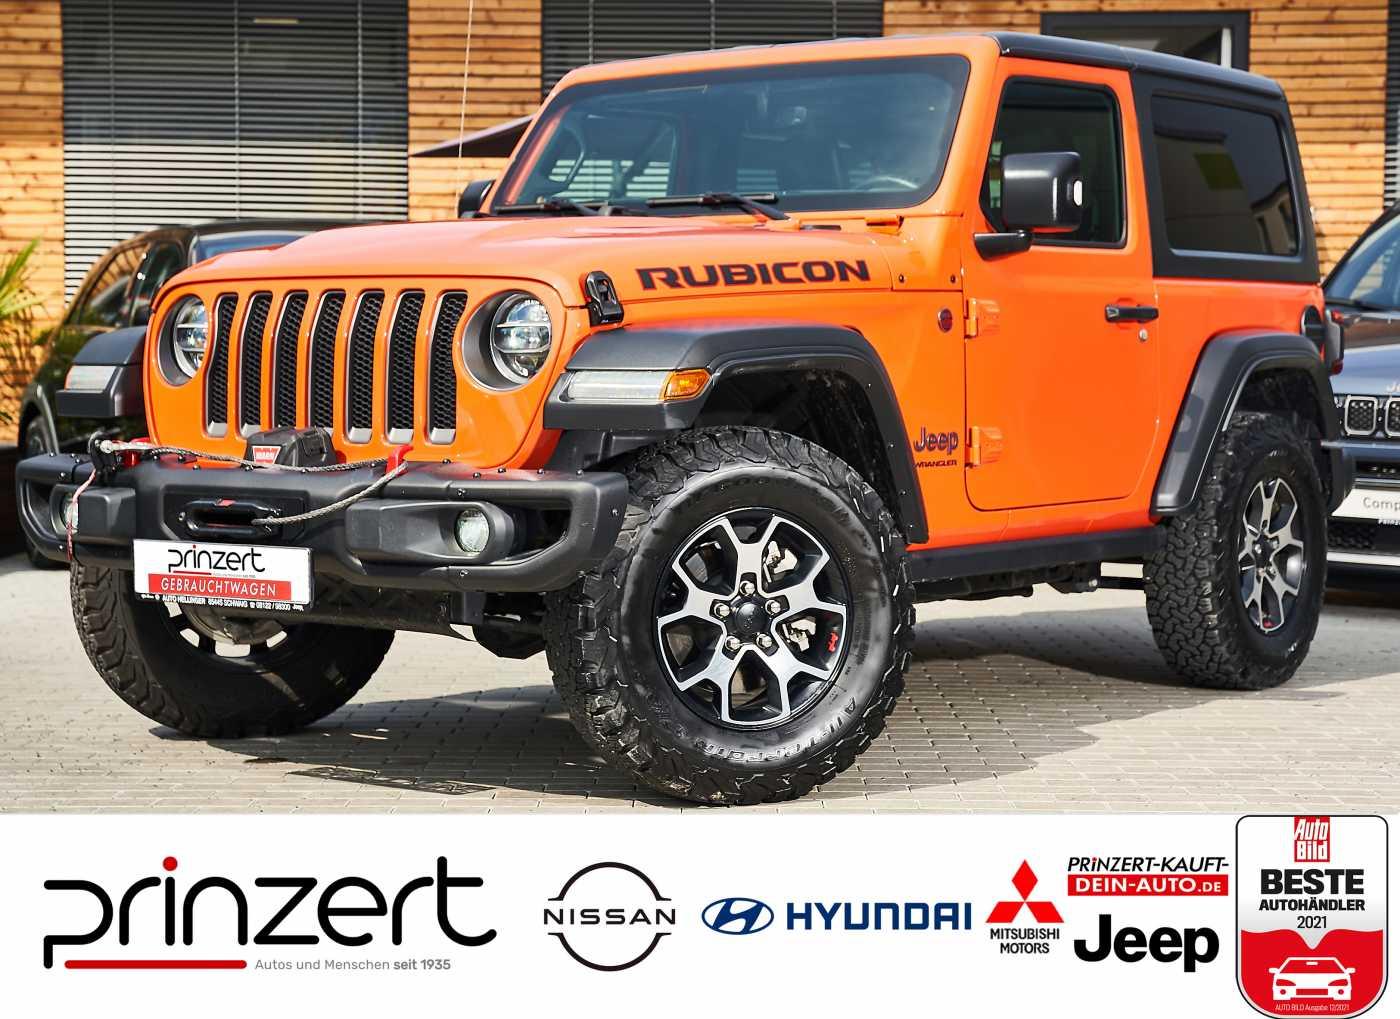 Jeep Wrangler 2.2 CRDi 4WD AT Rubicon Leder Technologie, Jahr 2018, Diesel